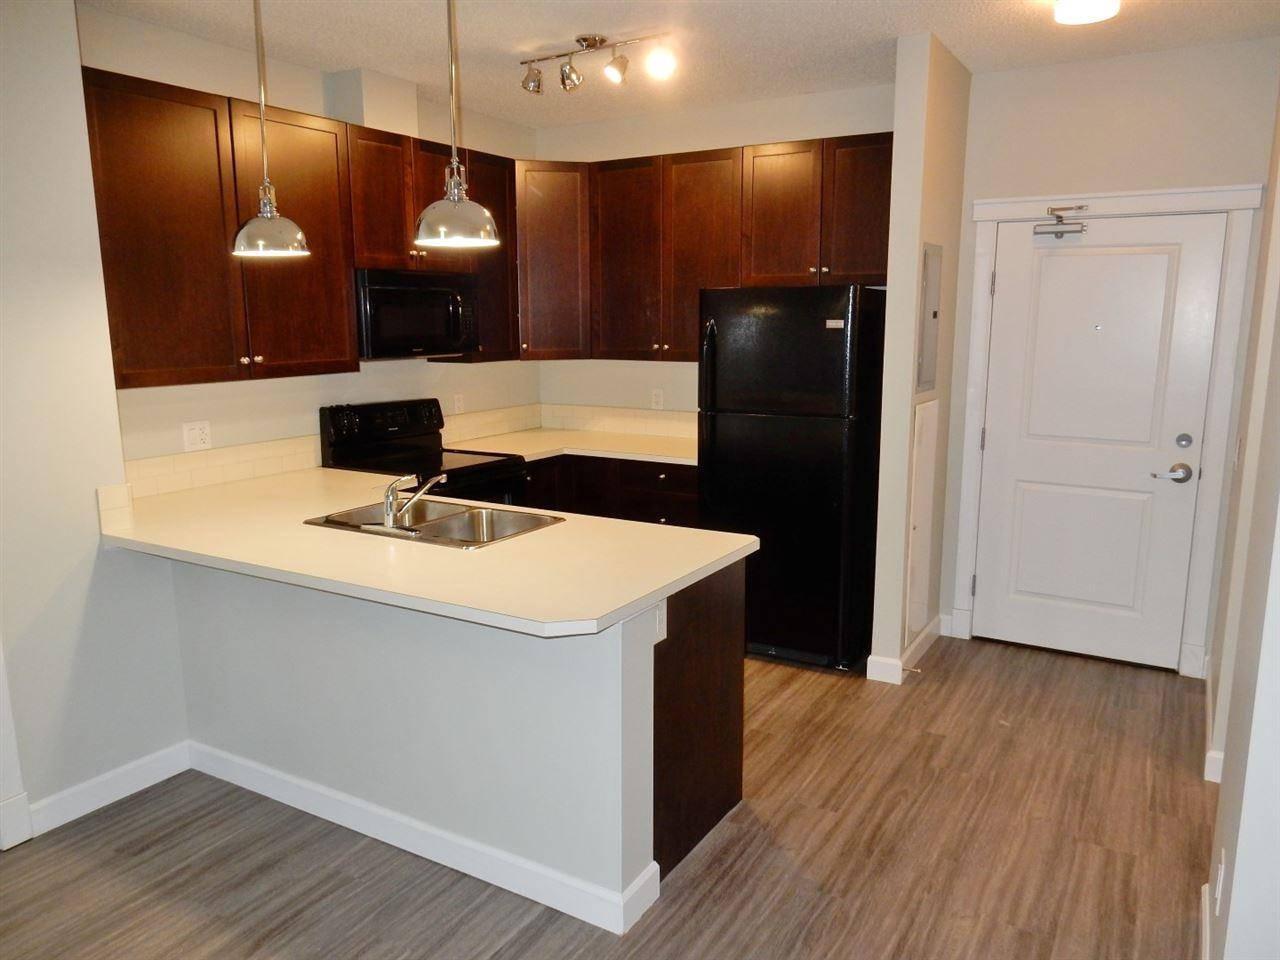 Condo for sale at 3719 Whitelaw Ln Nw Unit 403 Edmonton Alberta - MLS: E4182404